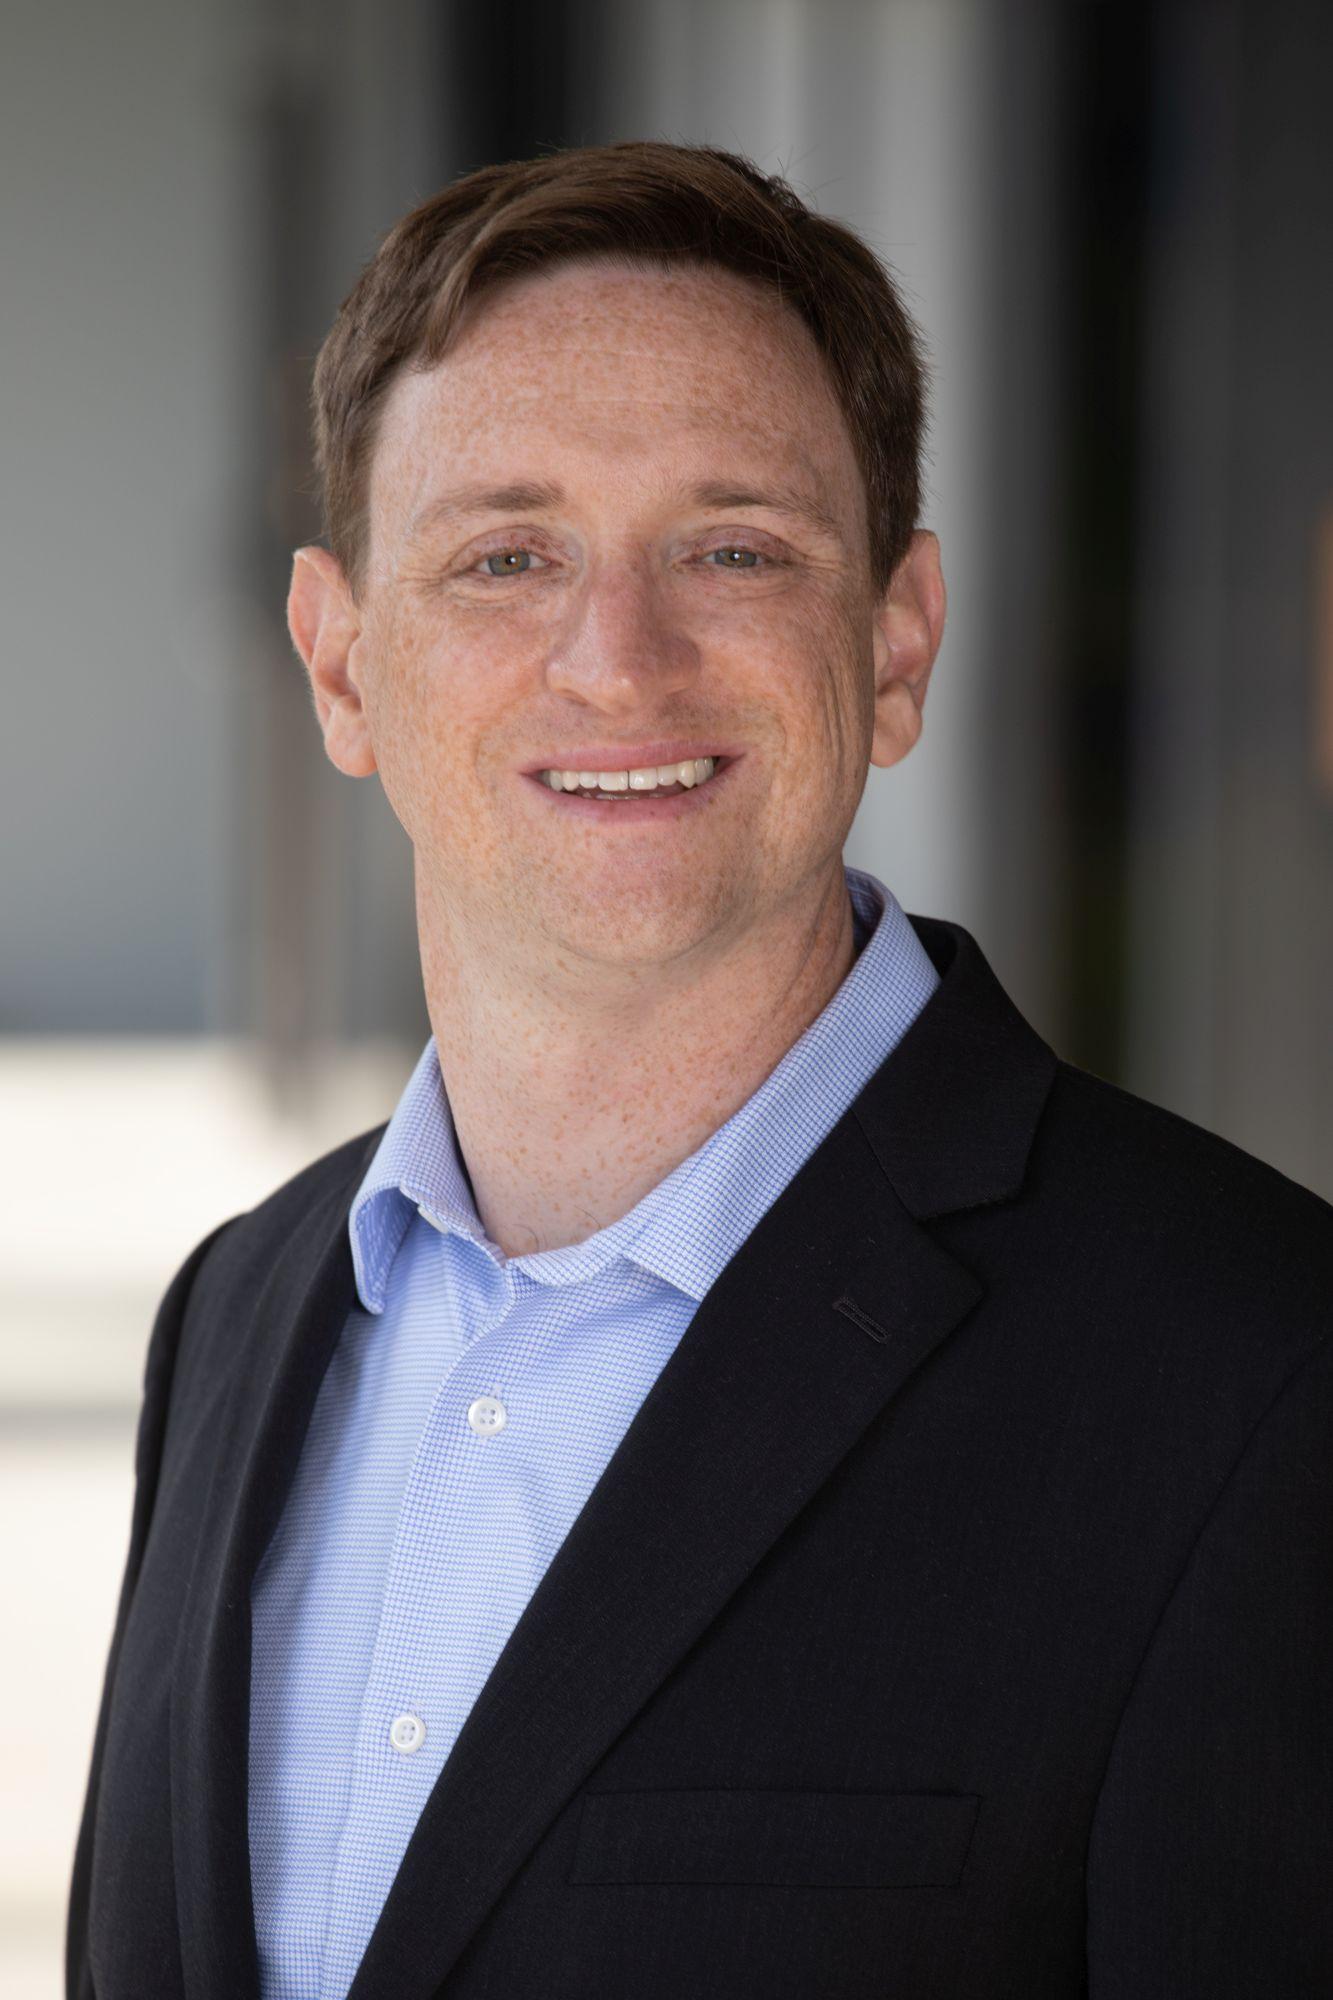 Jonathan Spector, MS, CFP®